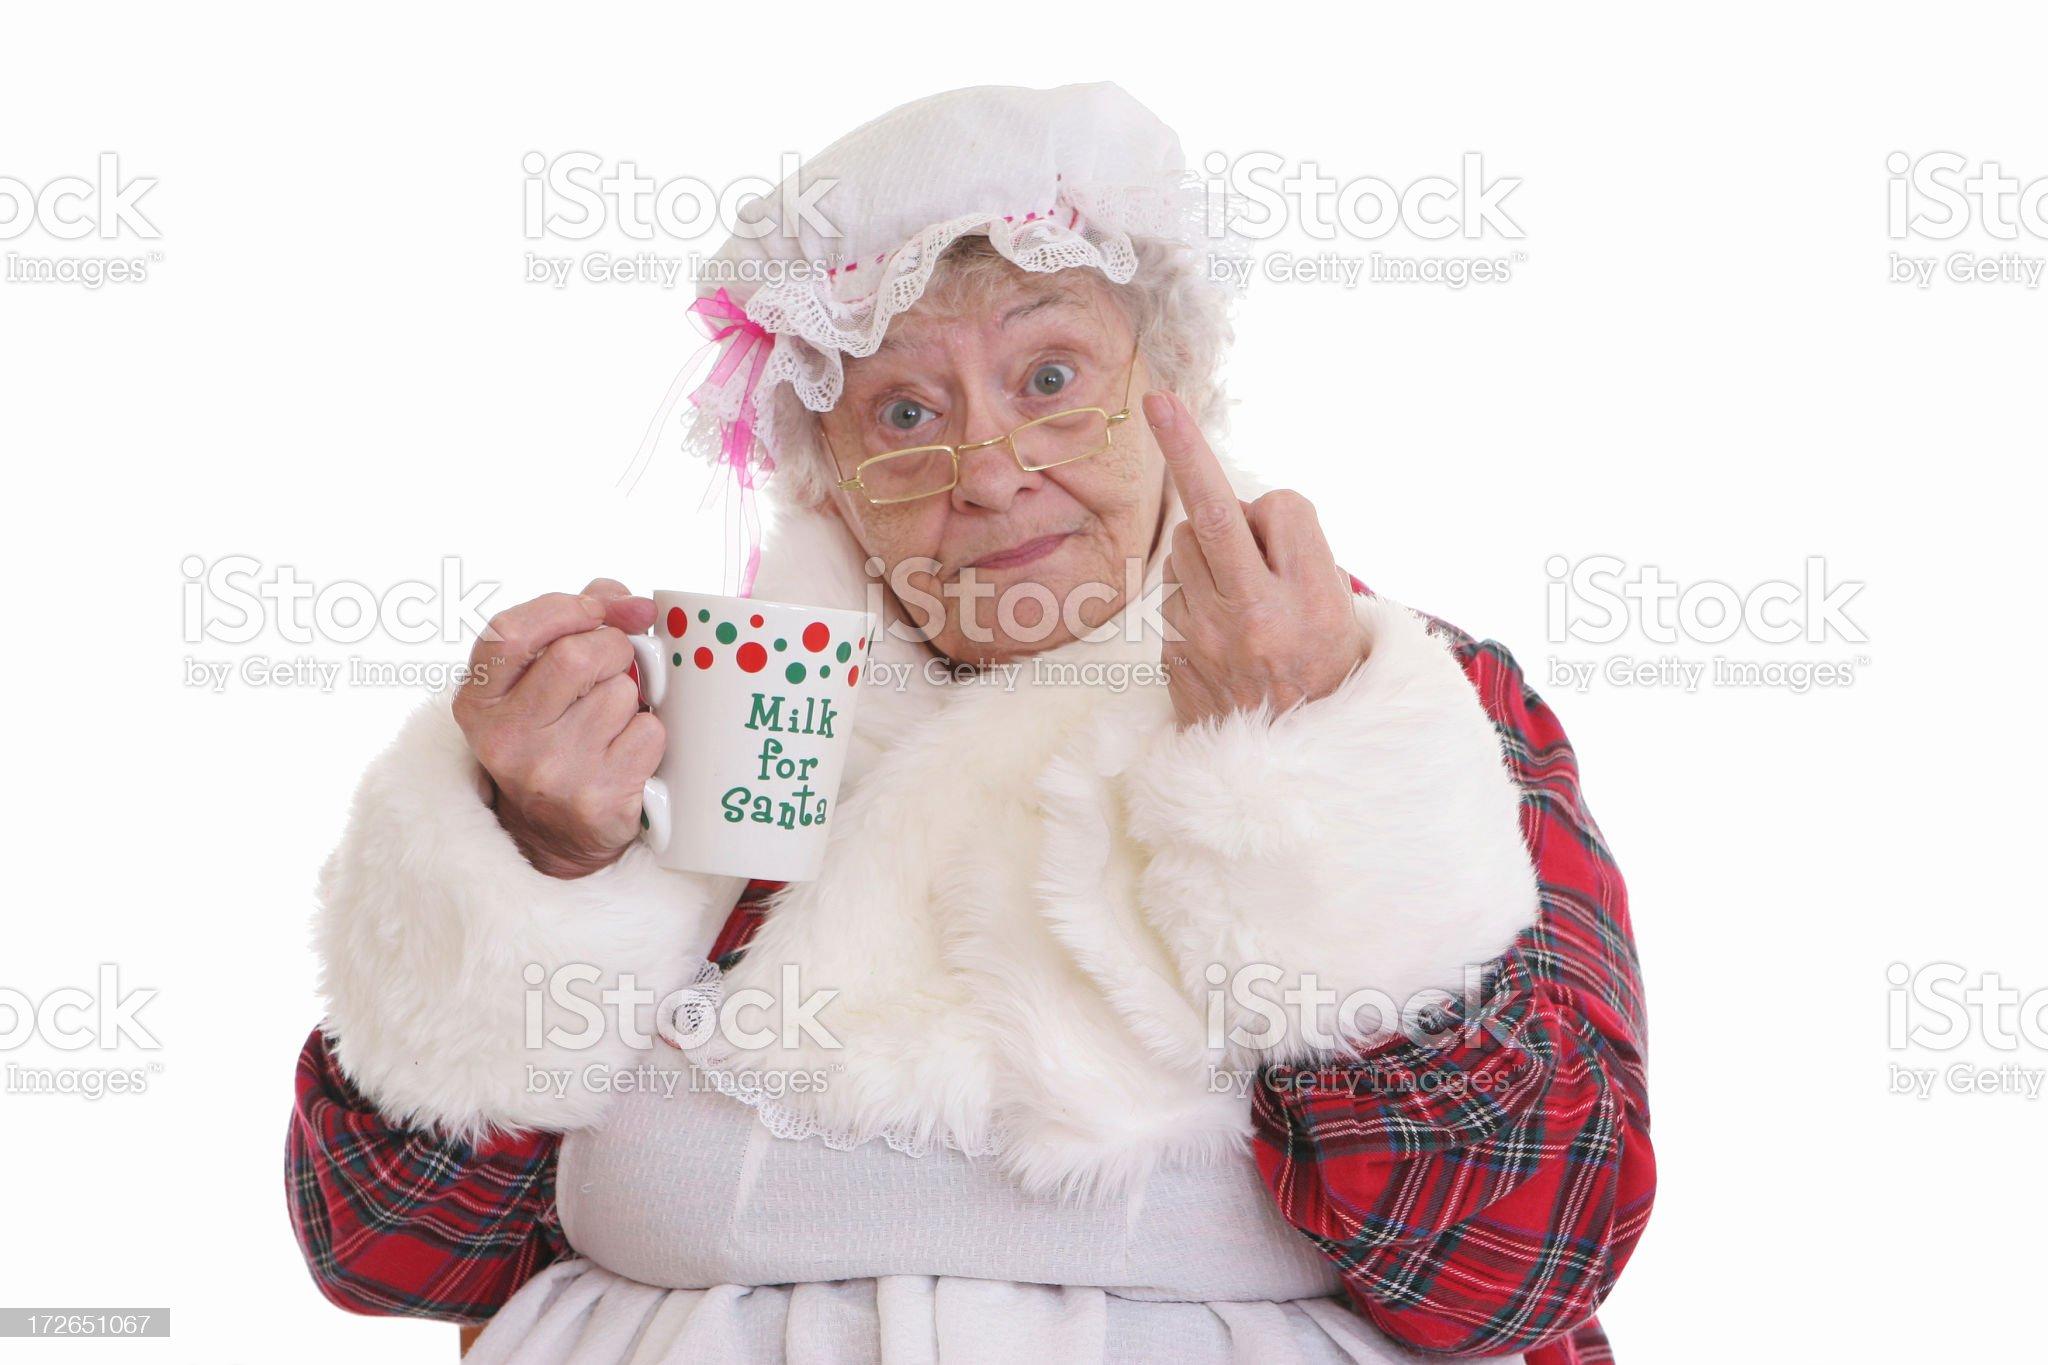 Stealing milk flip off Mrs Claus royalty-free stock photo